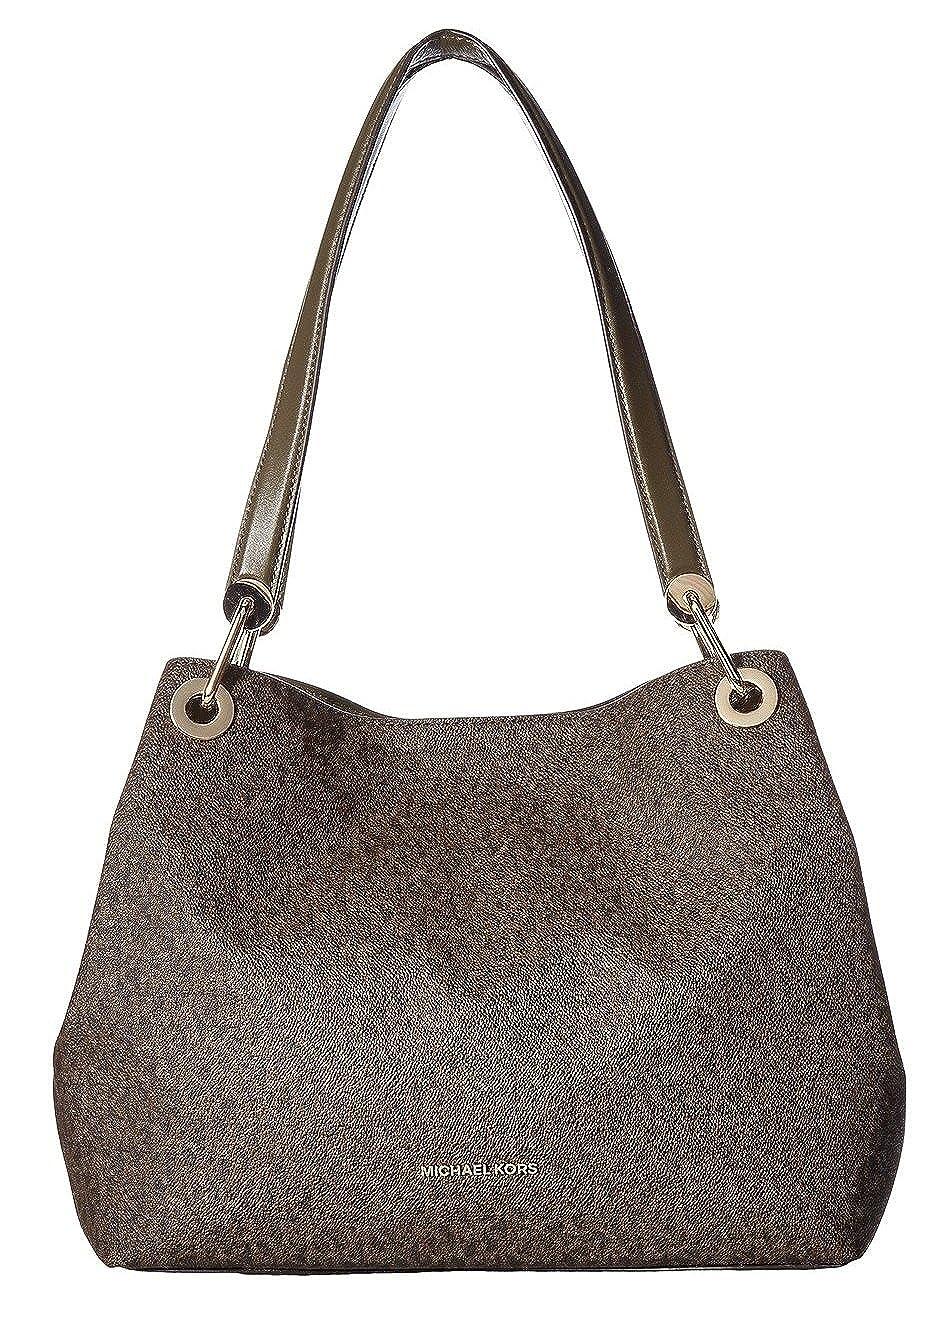 115e84cbdde1 MICHAEL Michael Kors Raven Large Shoulder Tote Olive/Brown: Handbags:  Amazon.com